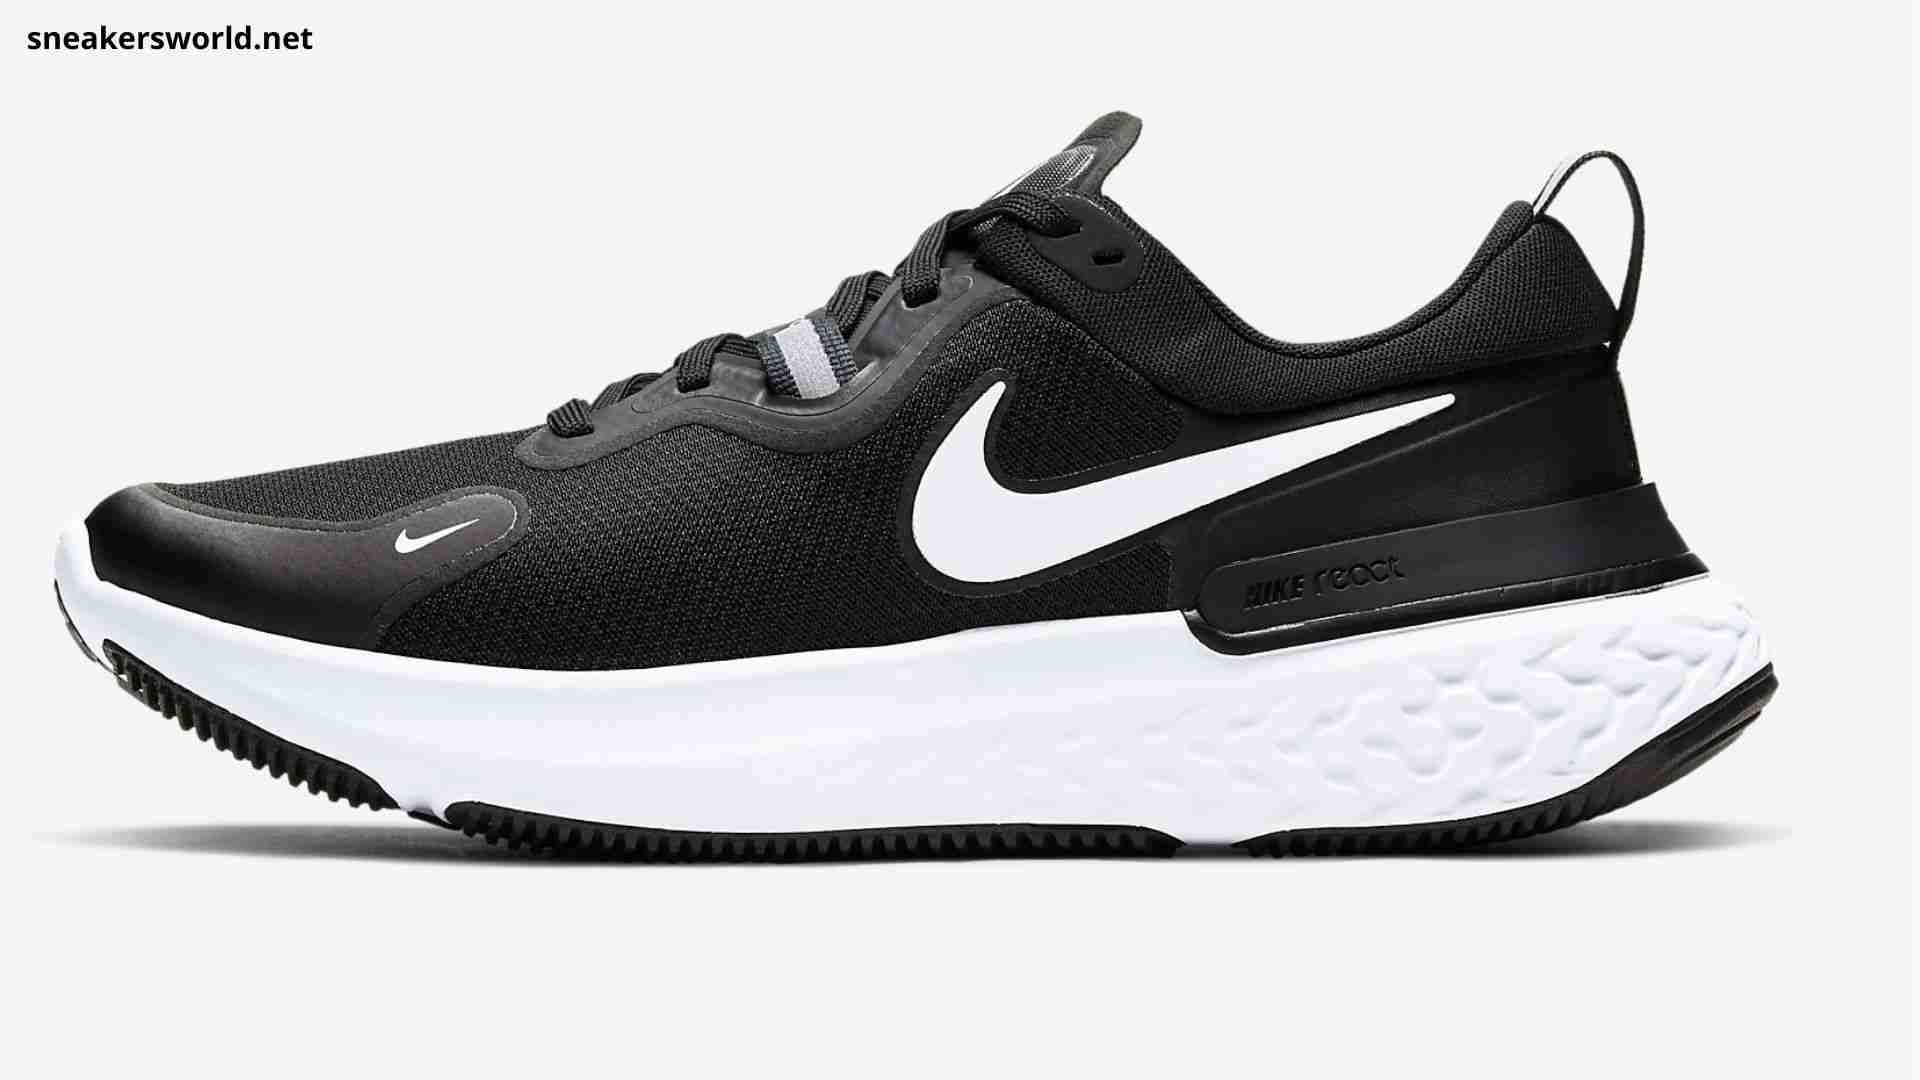 Nike react miler review images in sneakersworld.net